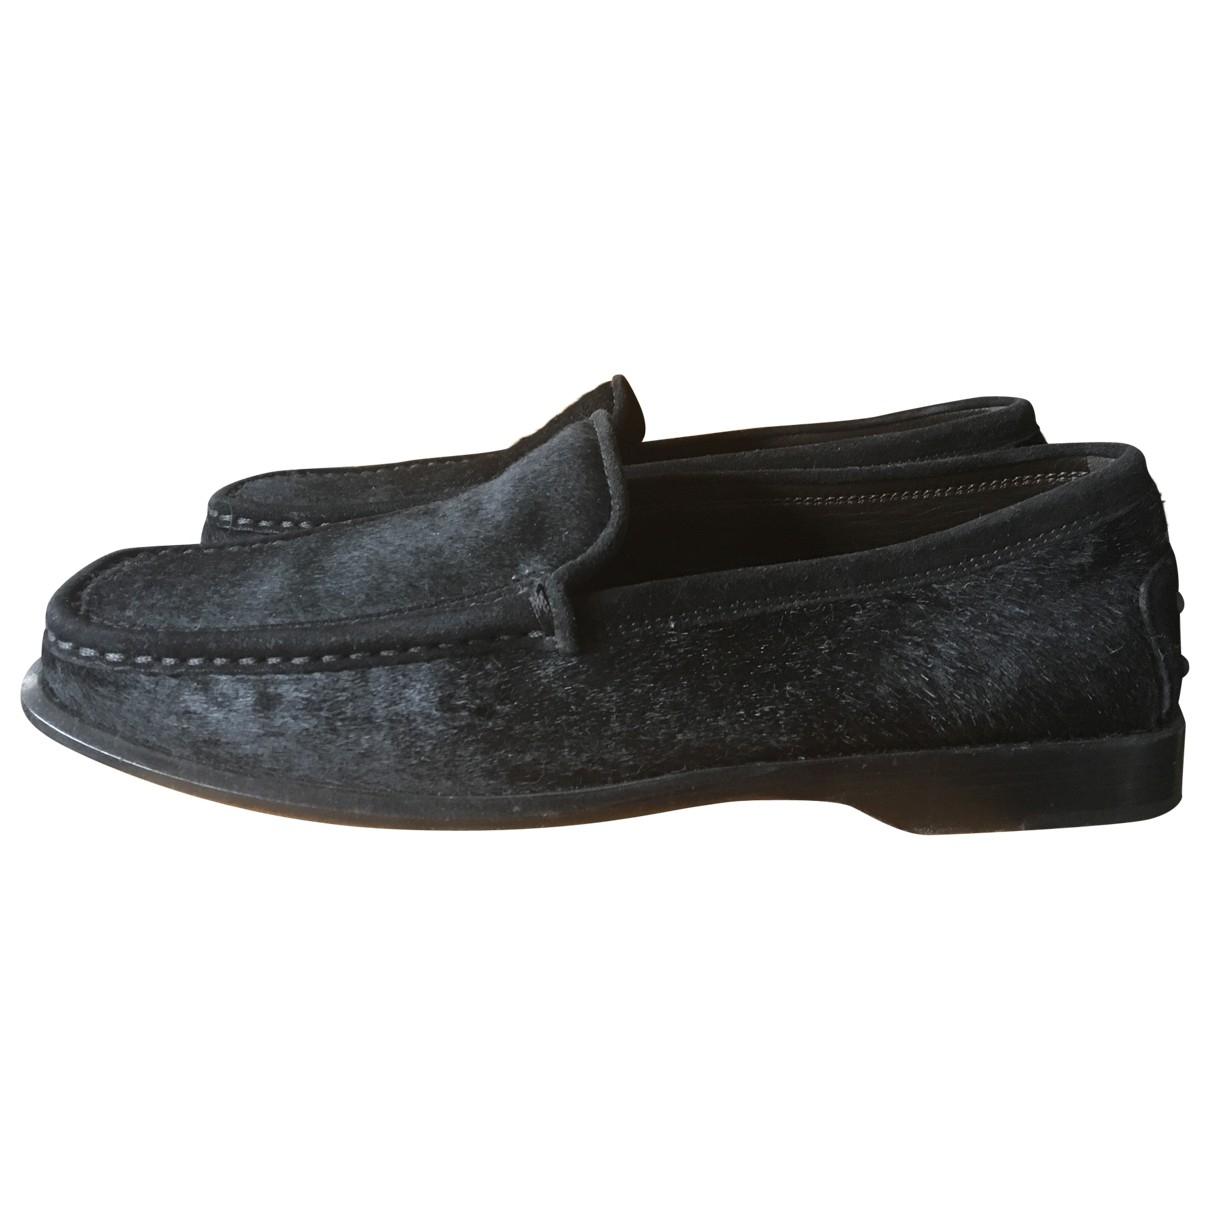 Tod's \N Black Pony-style calfskin Flats for Women 38 EU